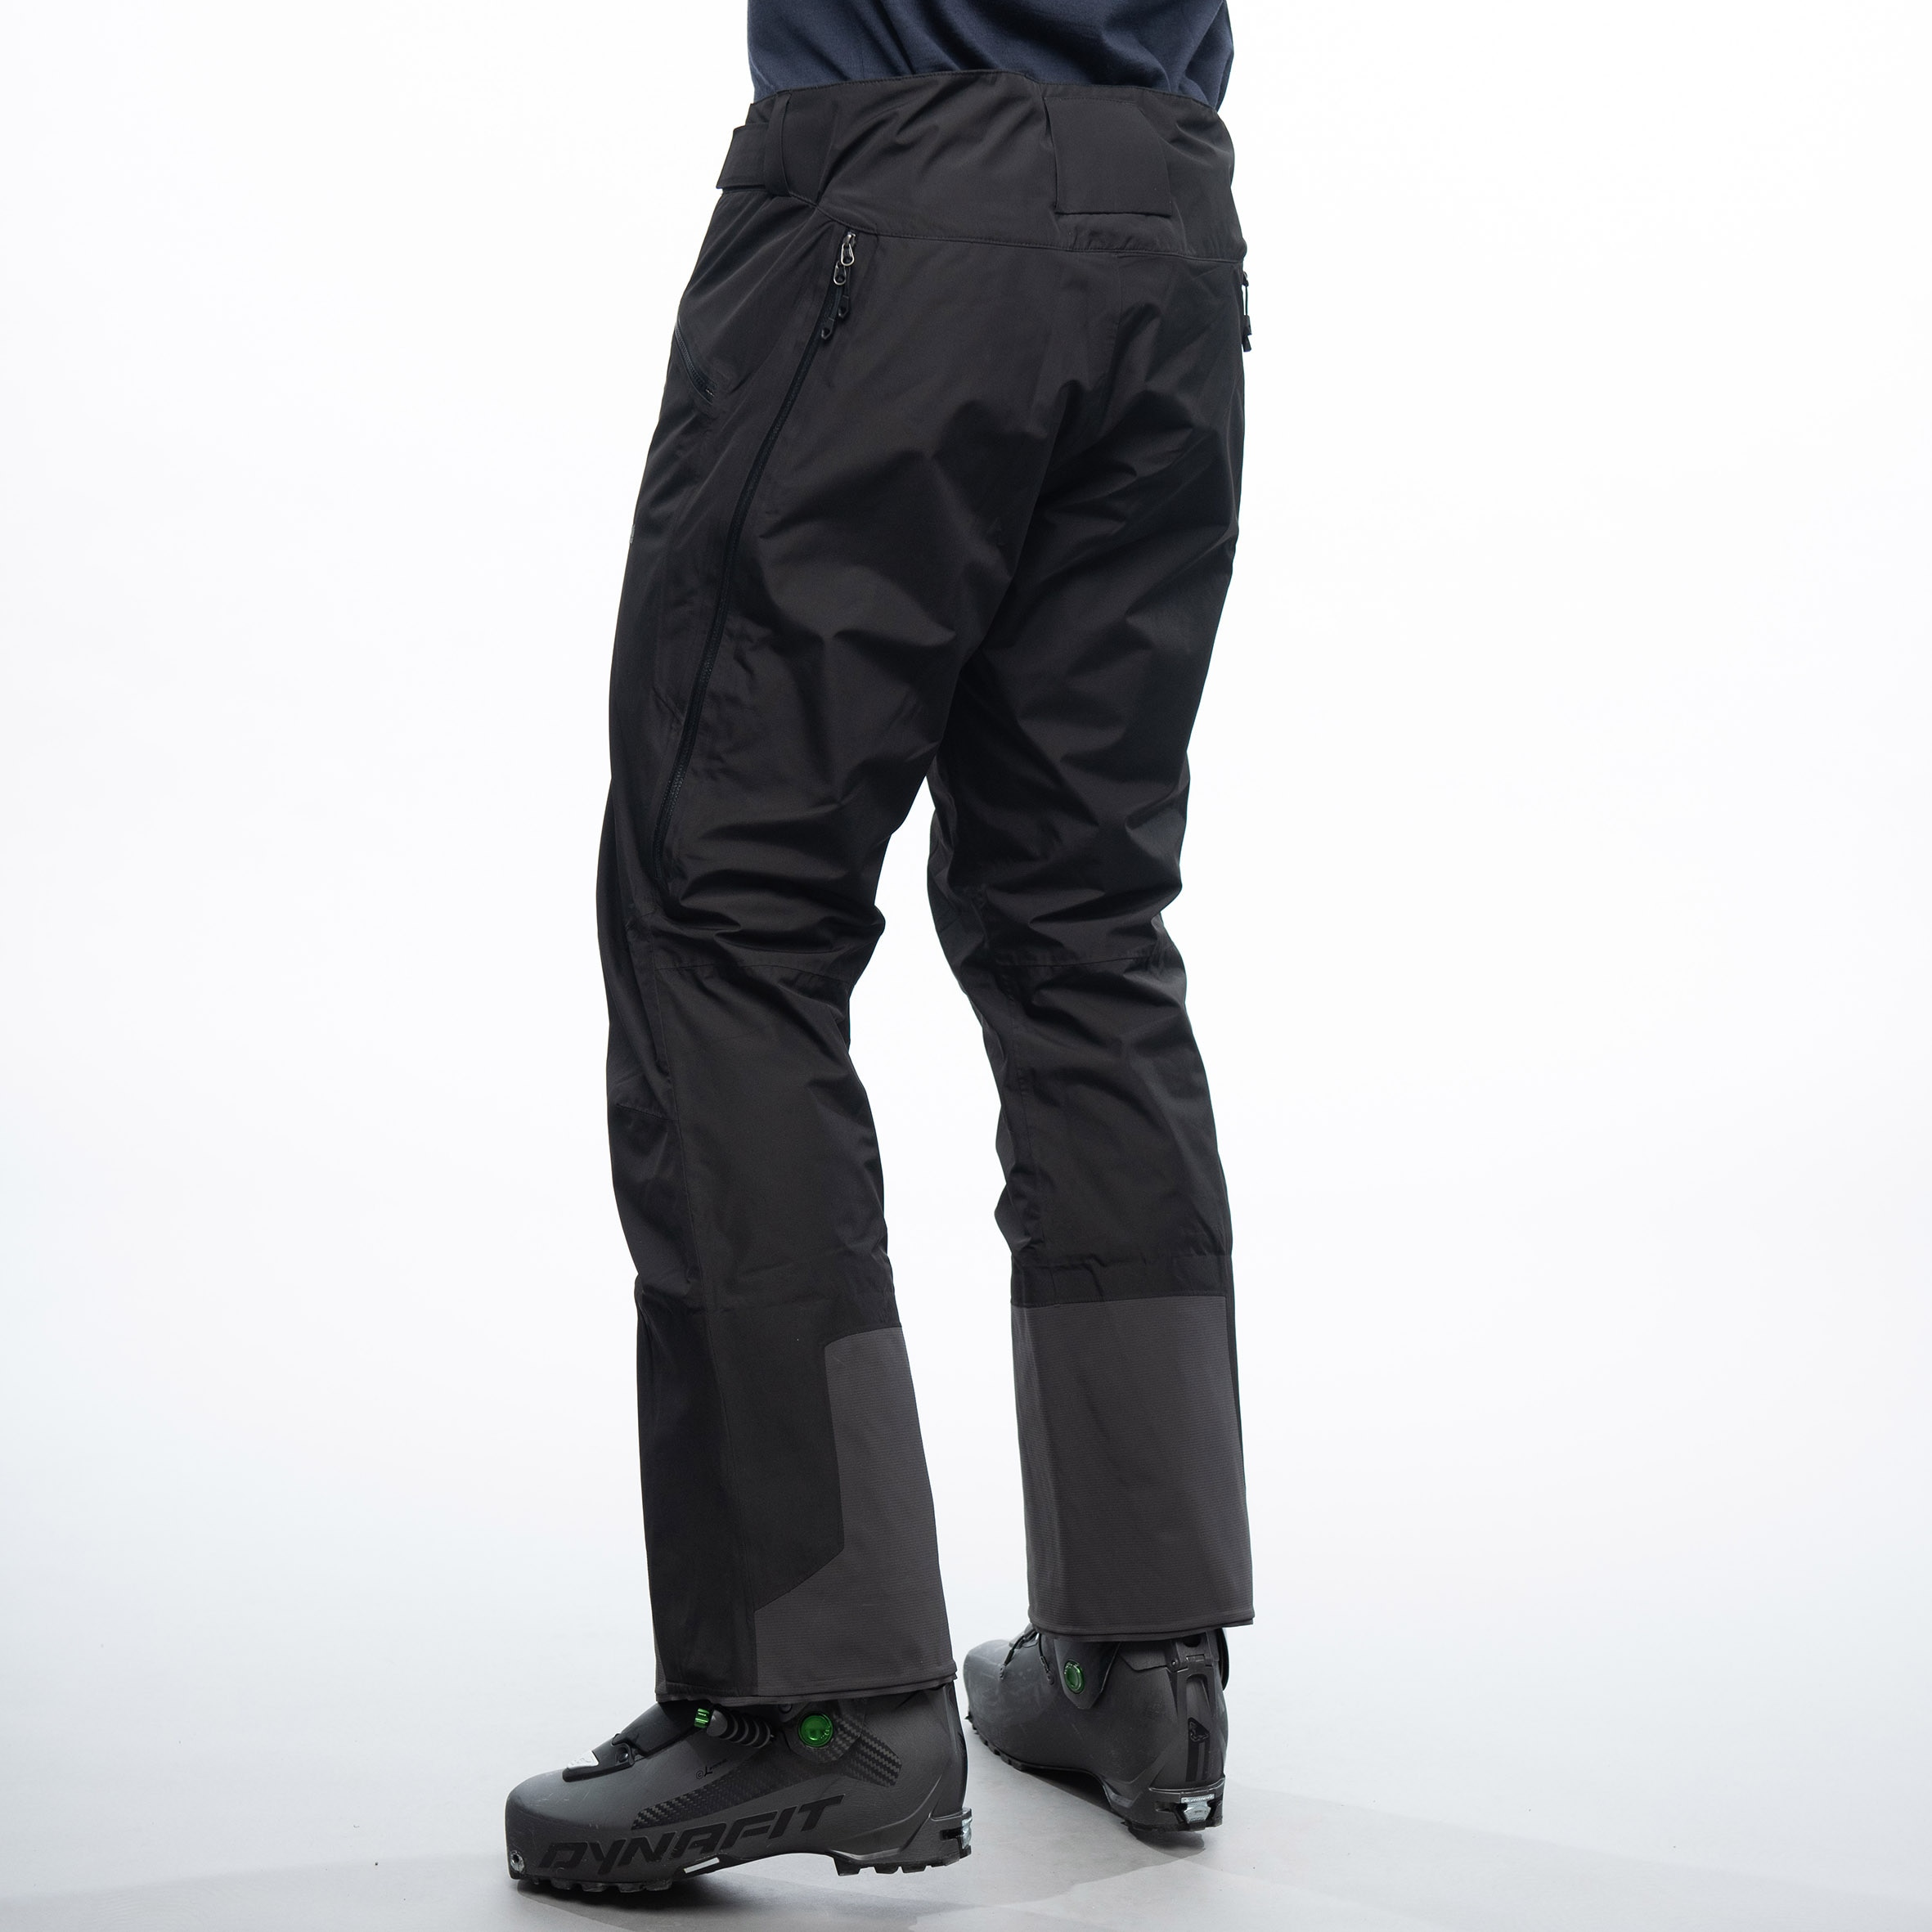 Stranda V2 Insulated Pants